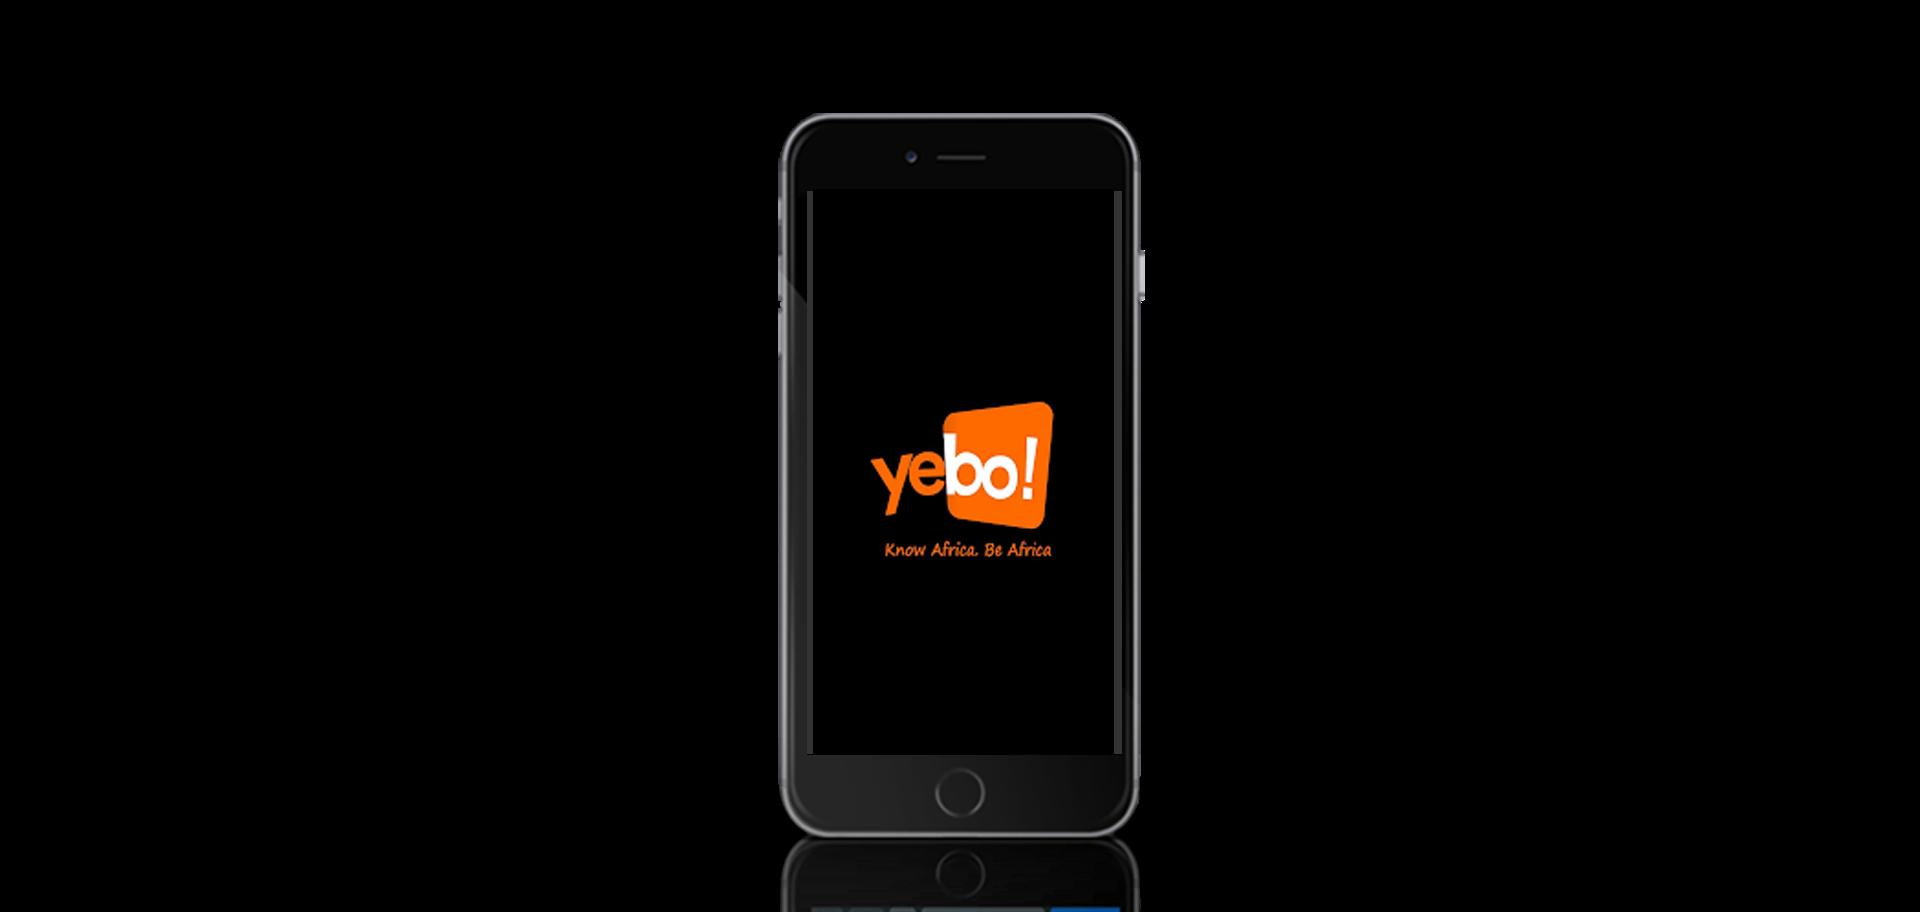 Yebo App